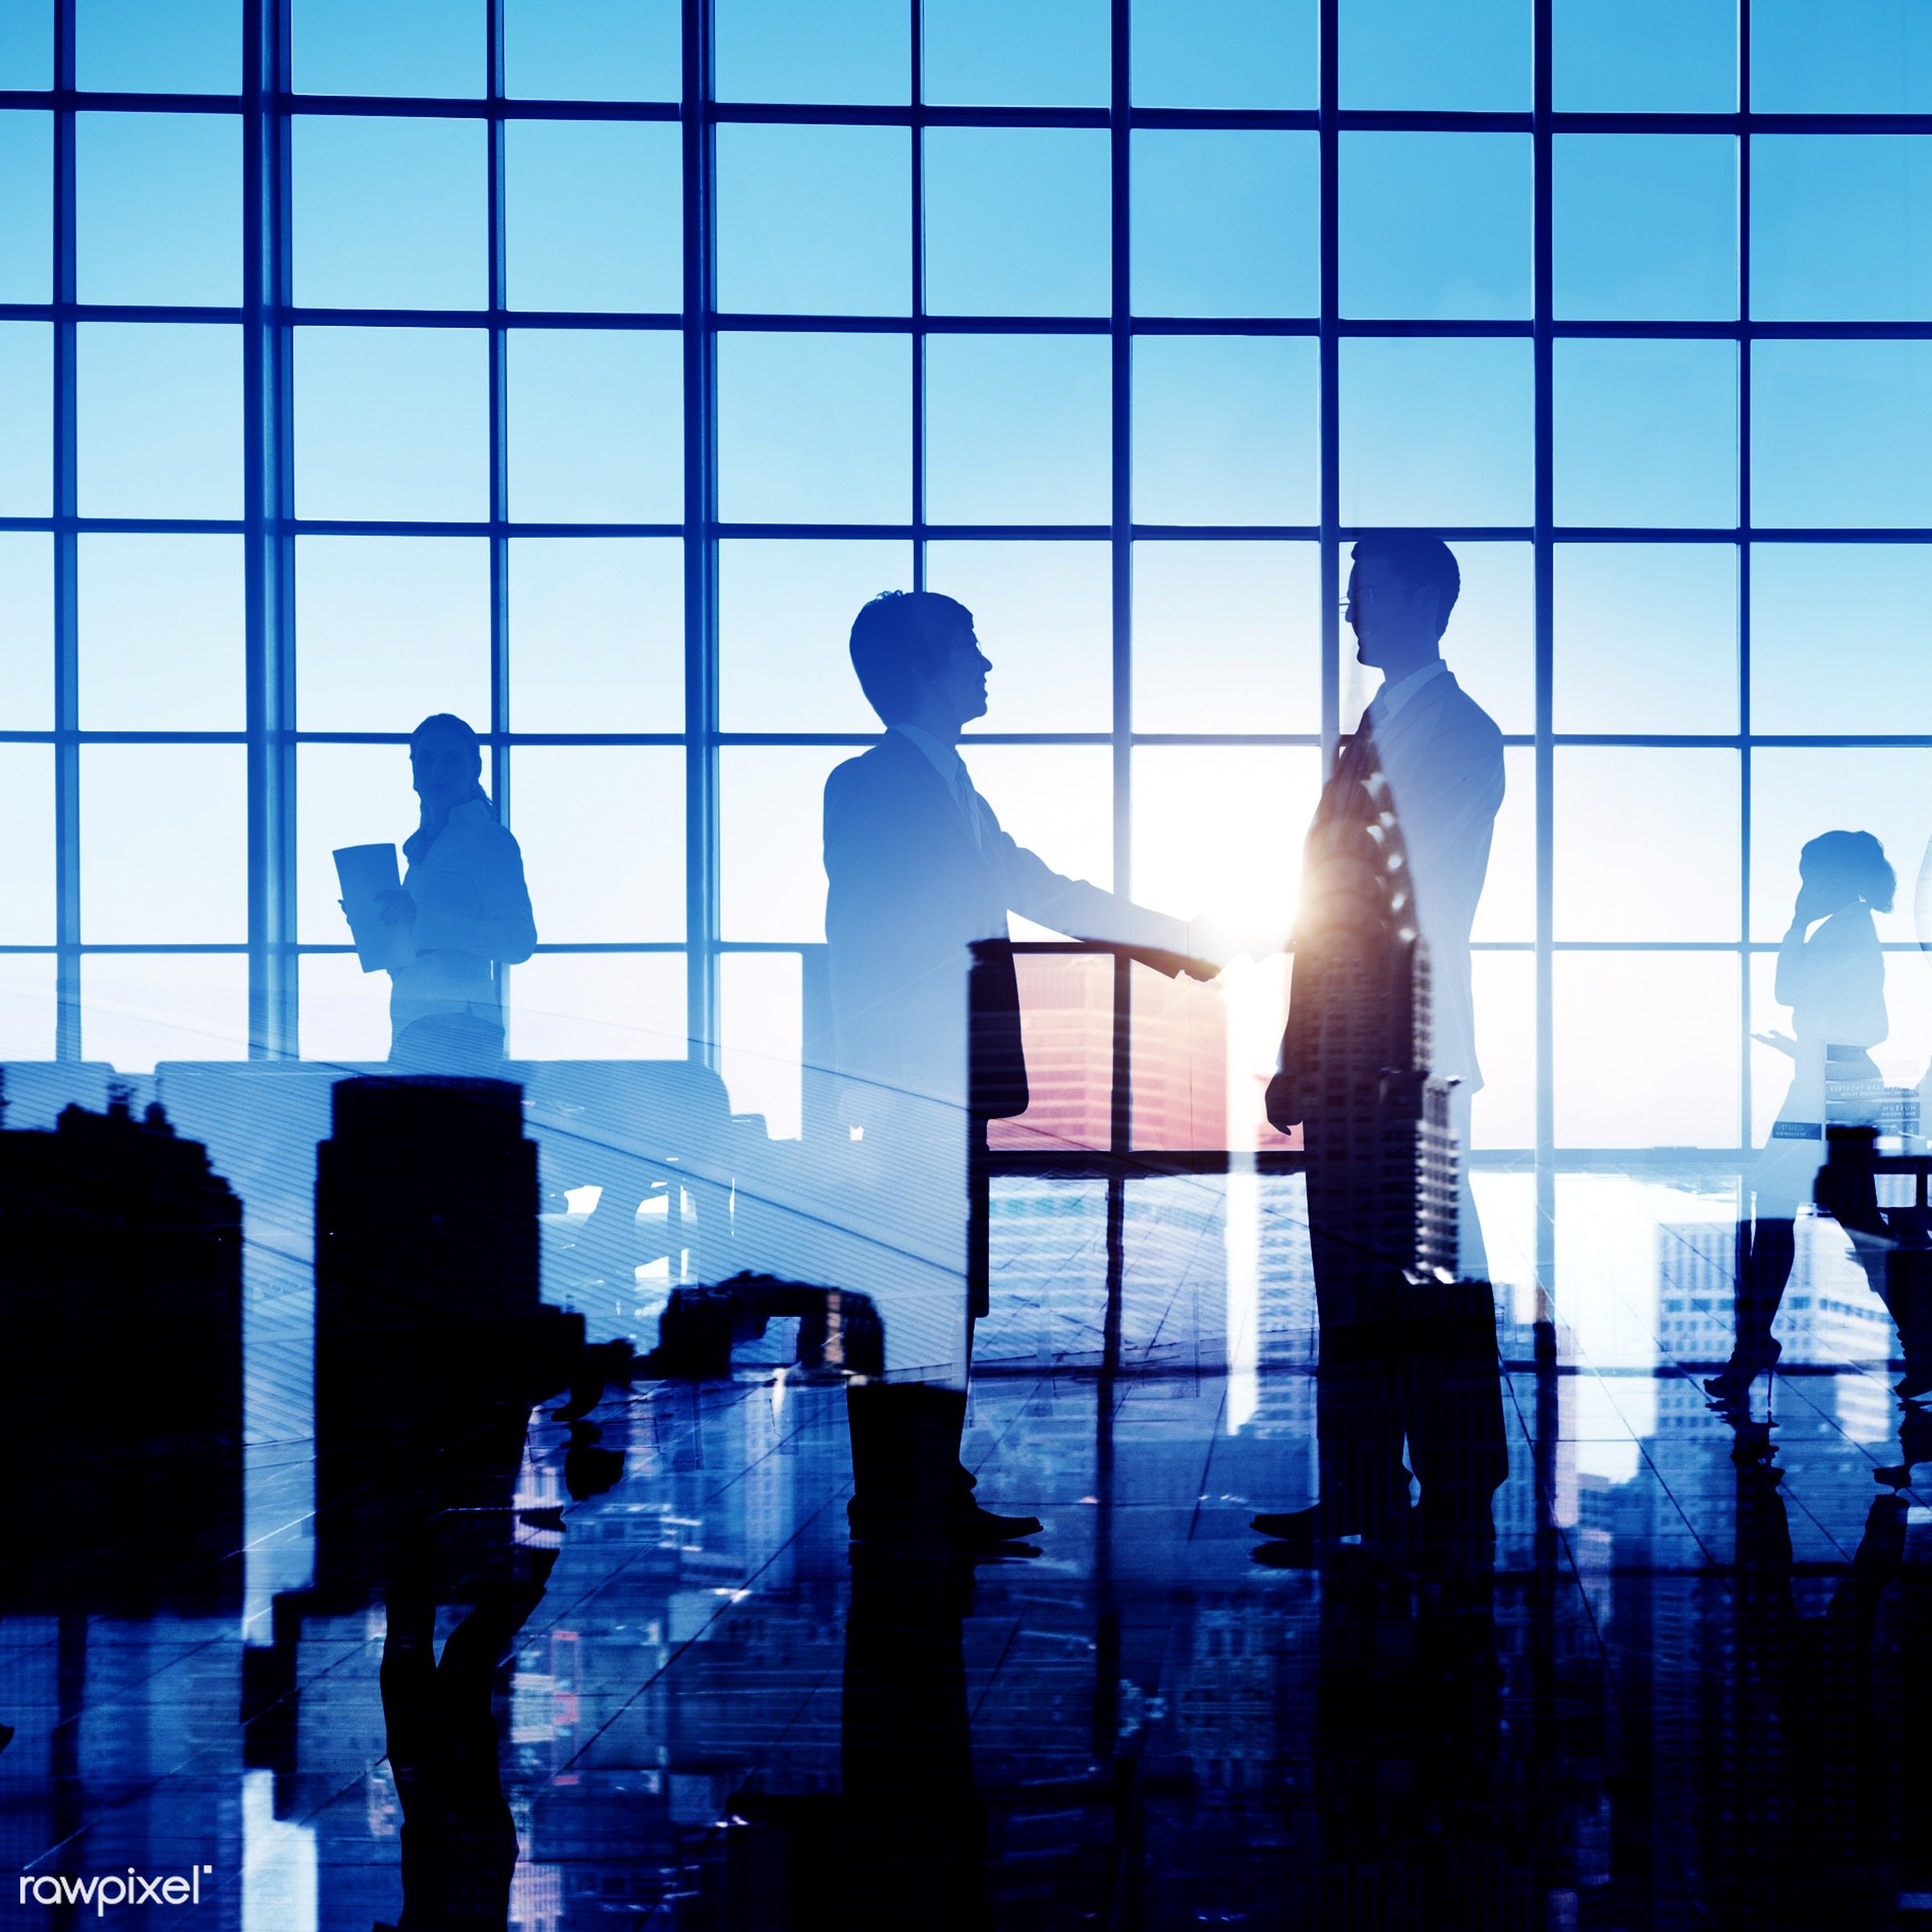 agreement, back lit, boardroom, brainstorming, building, business, business people, businessmen, businesswomen, city, city...